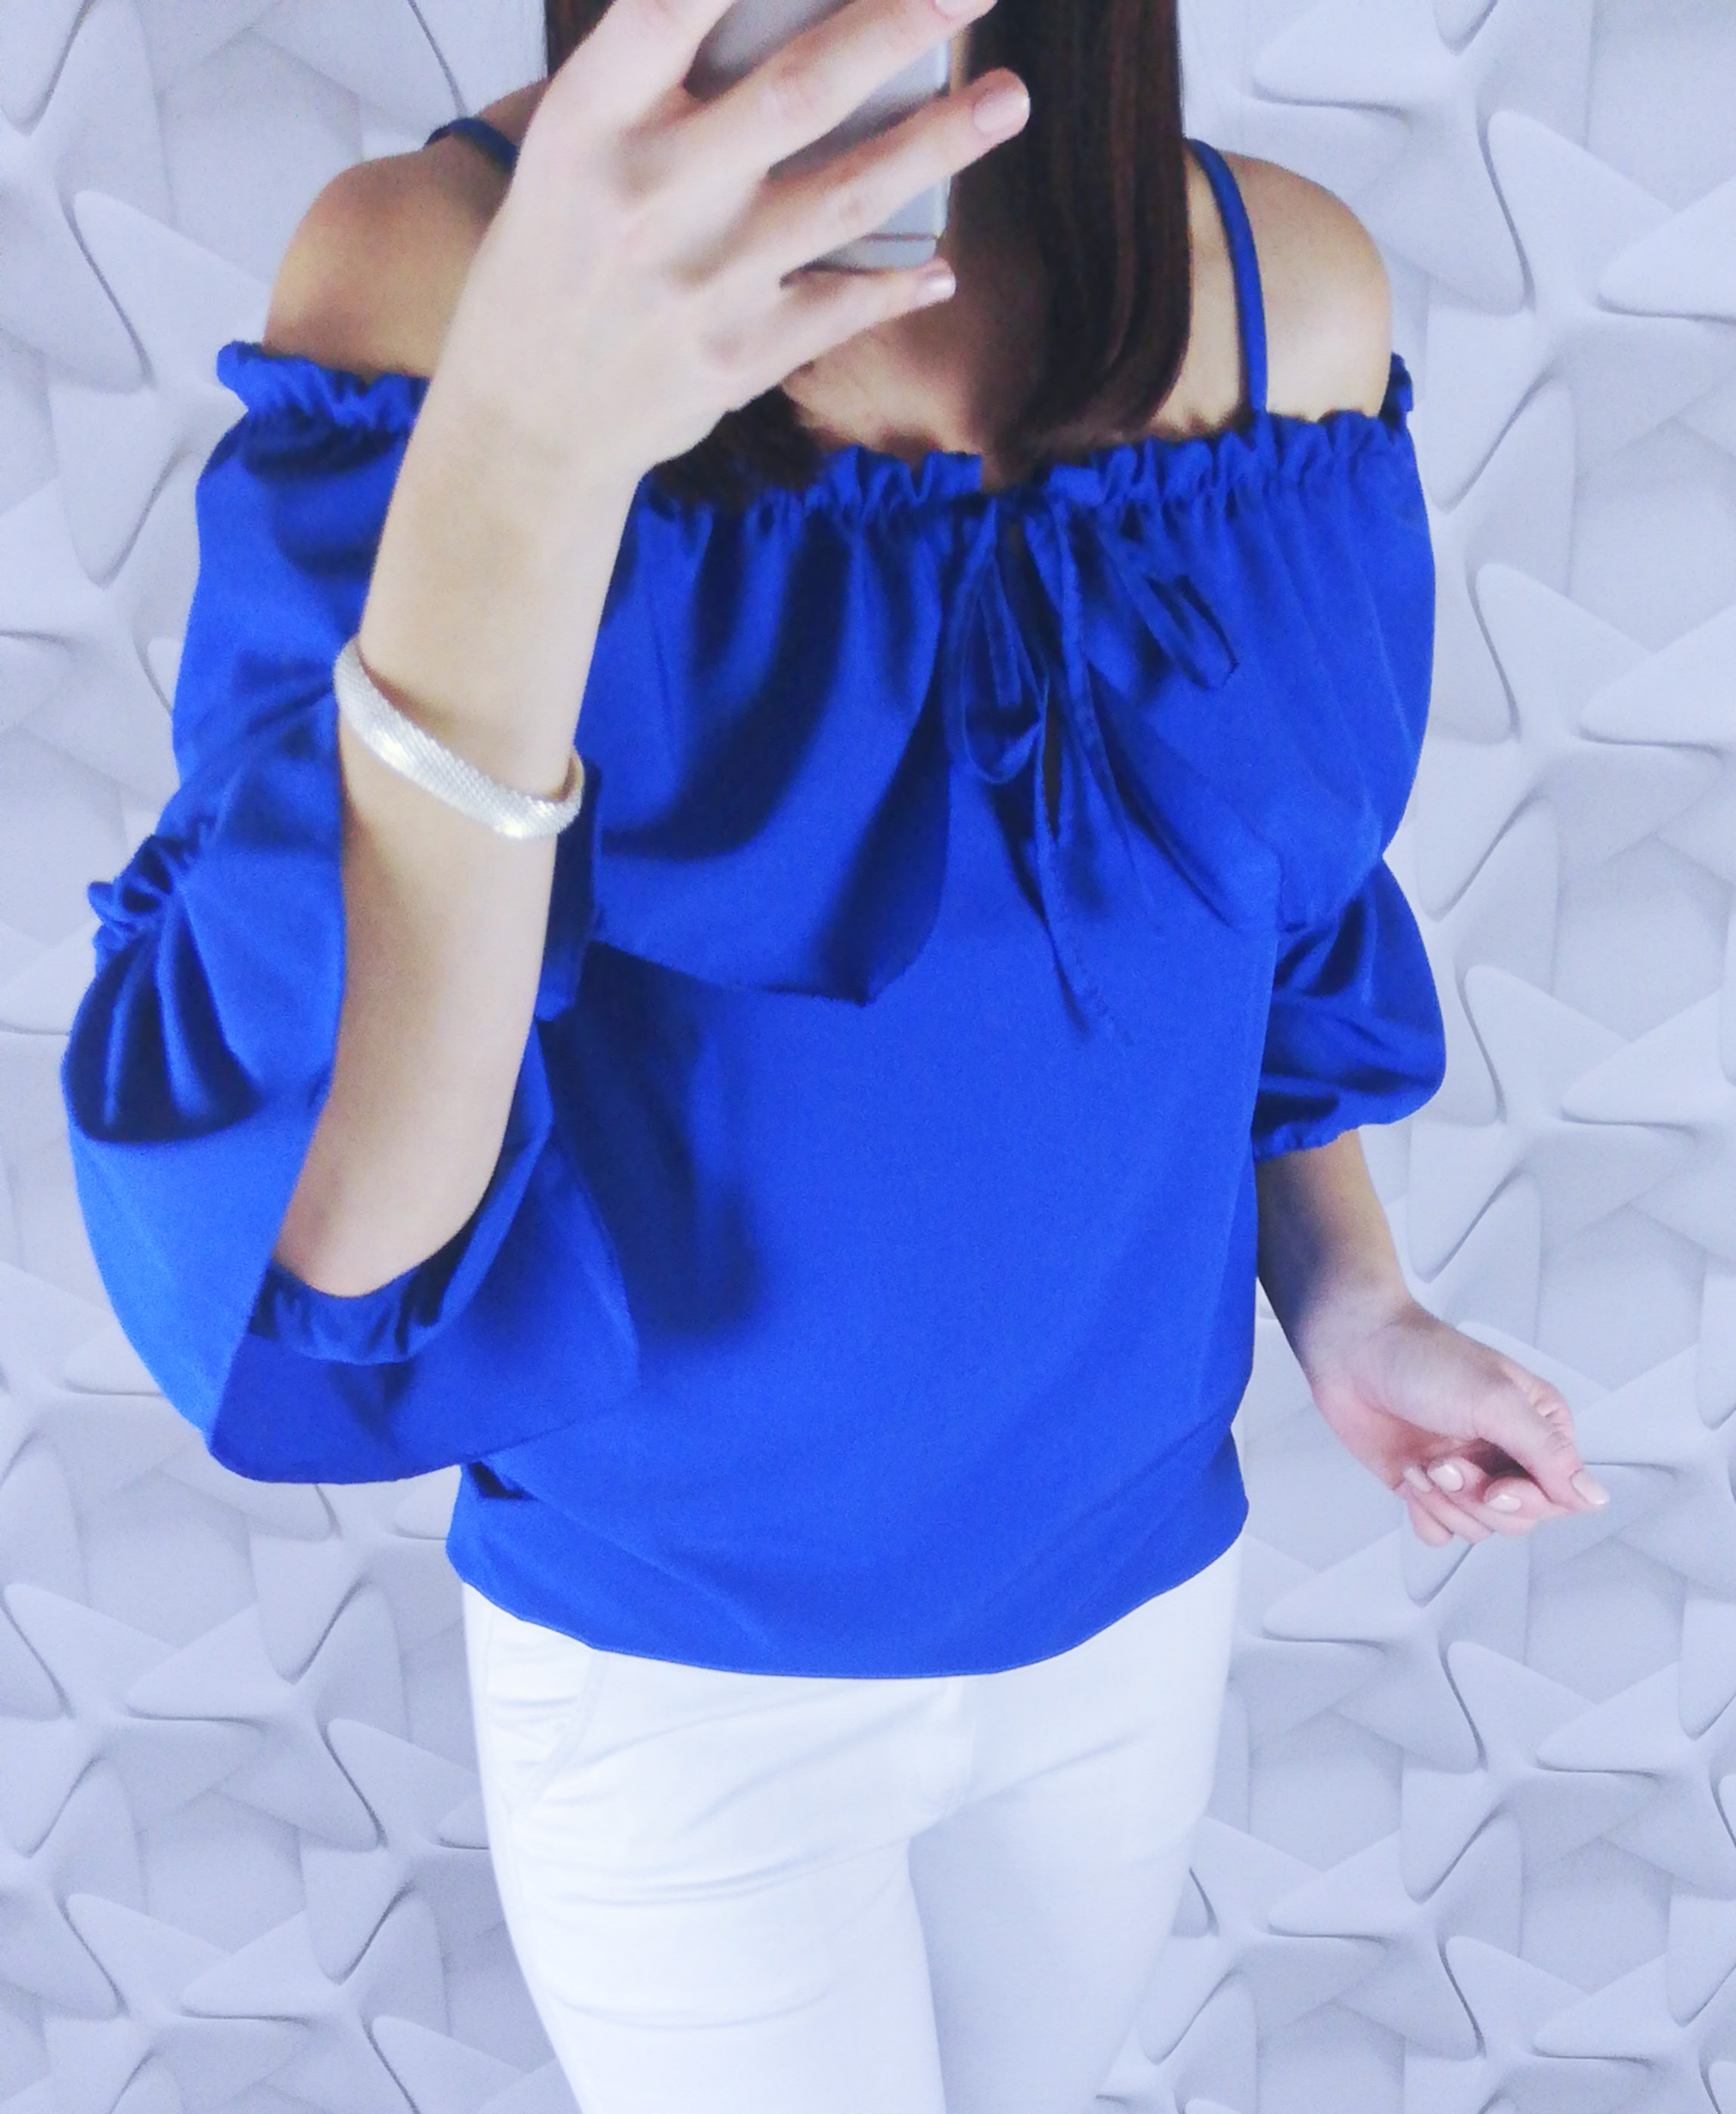 dámsky top,dámska blúzka, elegantná dámska blúzka, blúzka s mašľou,biela blúzka,modrá blúzka s odhalenymi ramenami